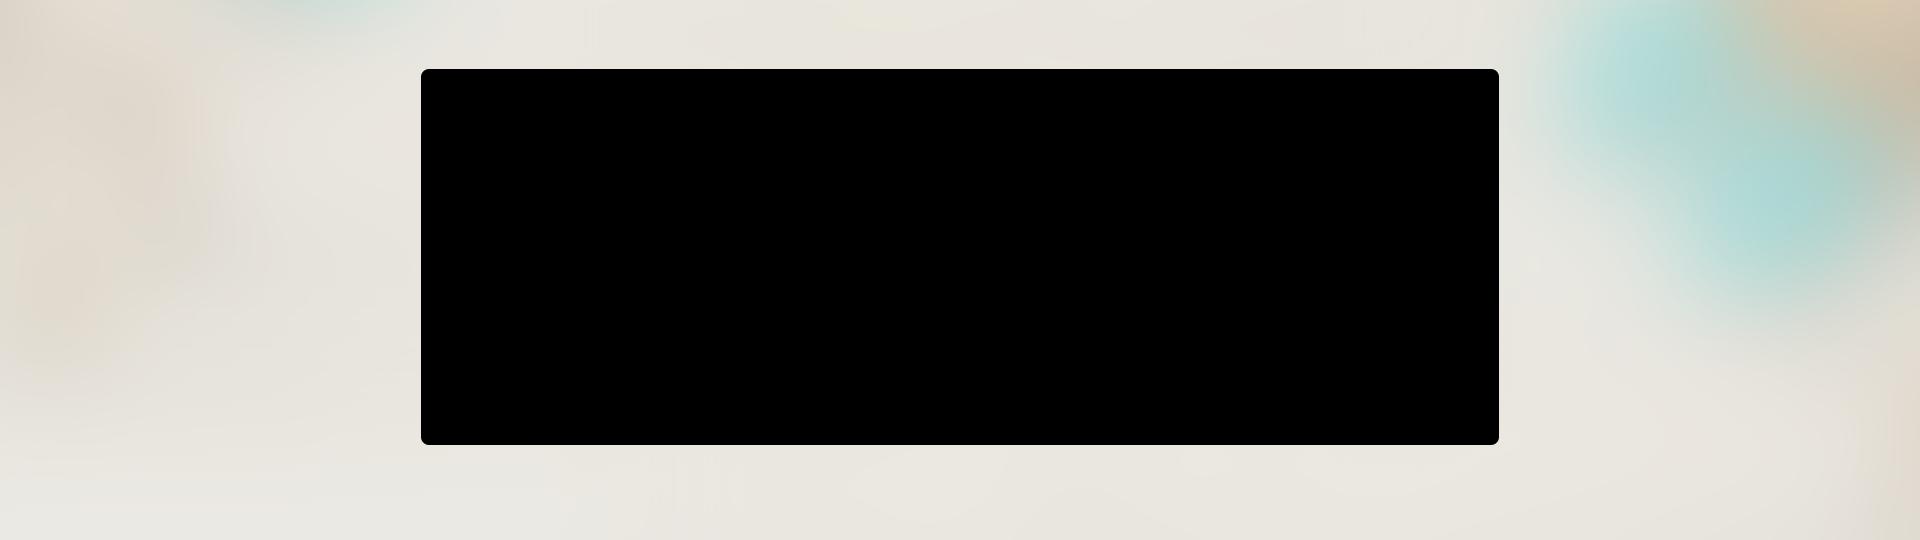 CATEGORY-KITAP-SEPETTE20INDIRIMLIKITAPLAR-04-08